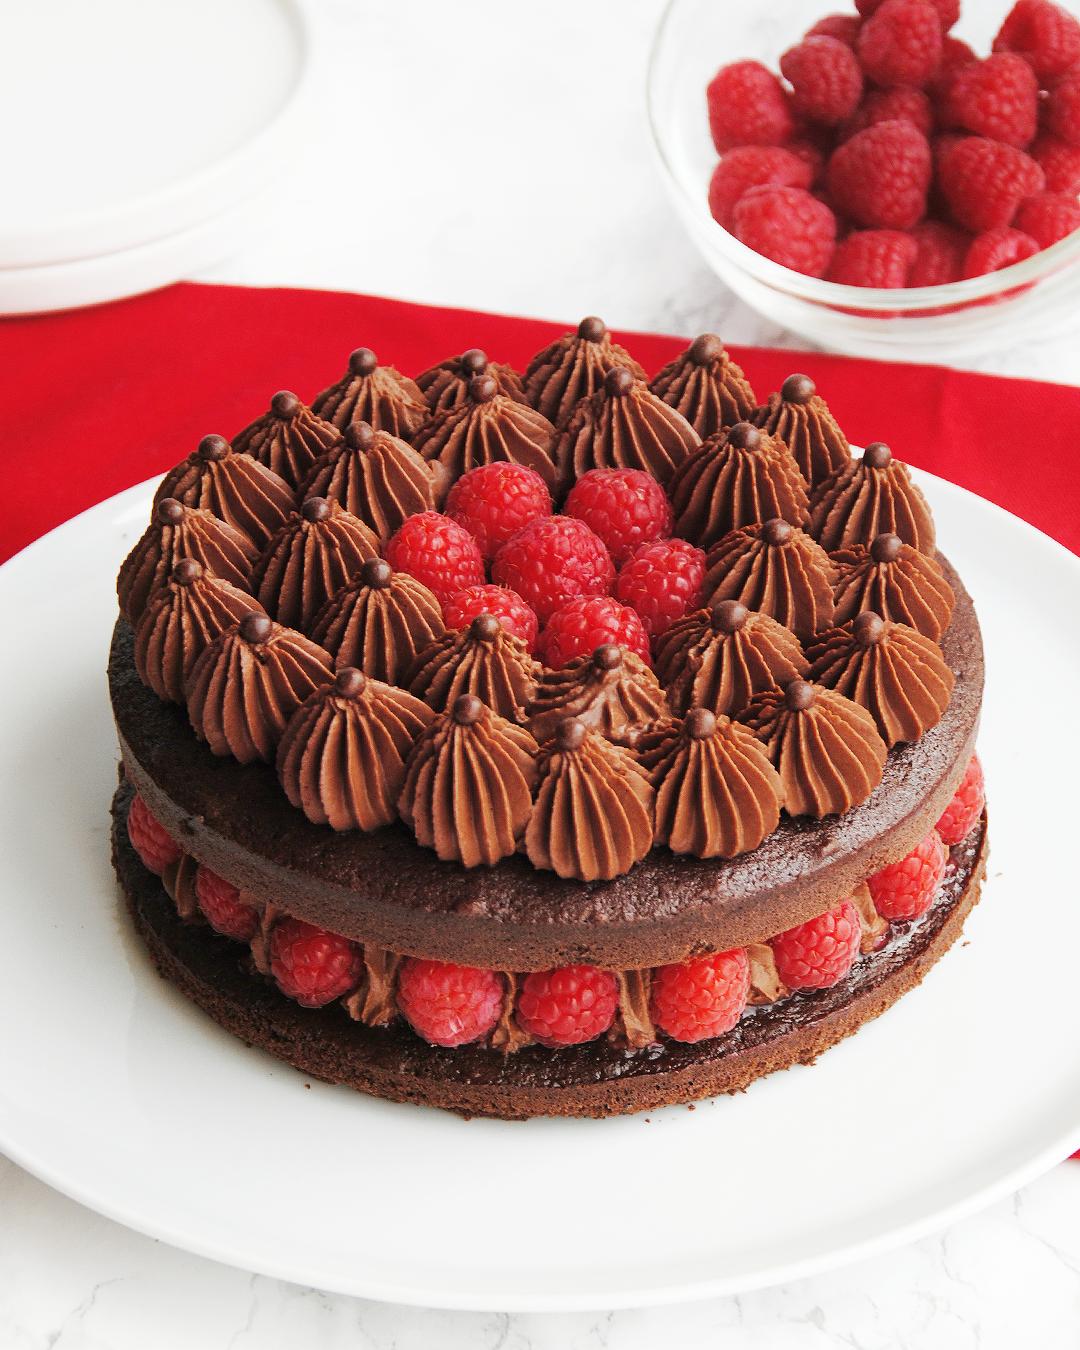 Layer Cake Chocolat Framboise Chocolat Framboise Gateau Chocolat Framboise Cake Chocolat